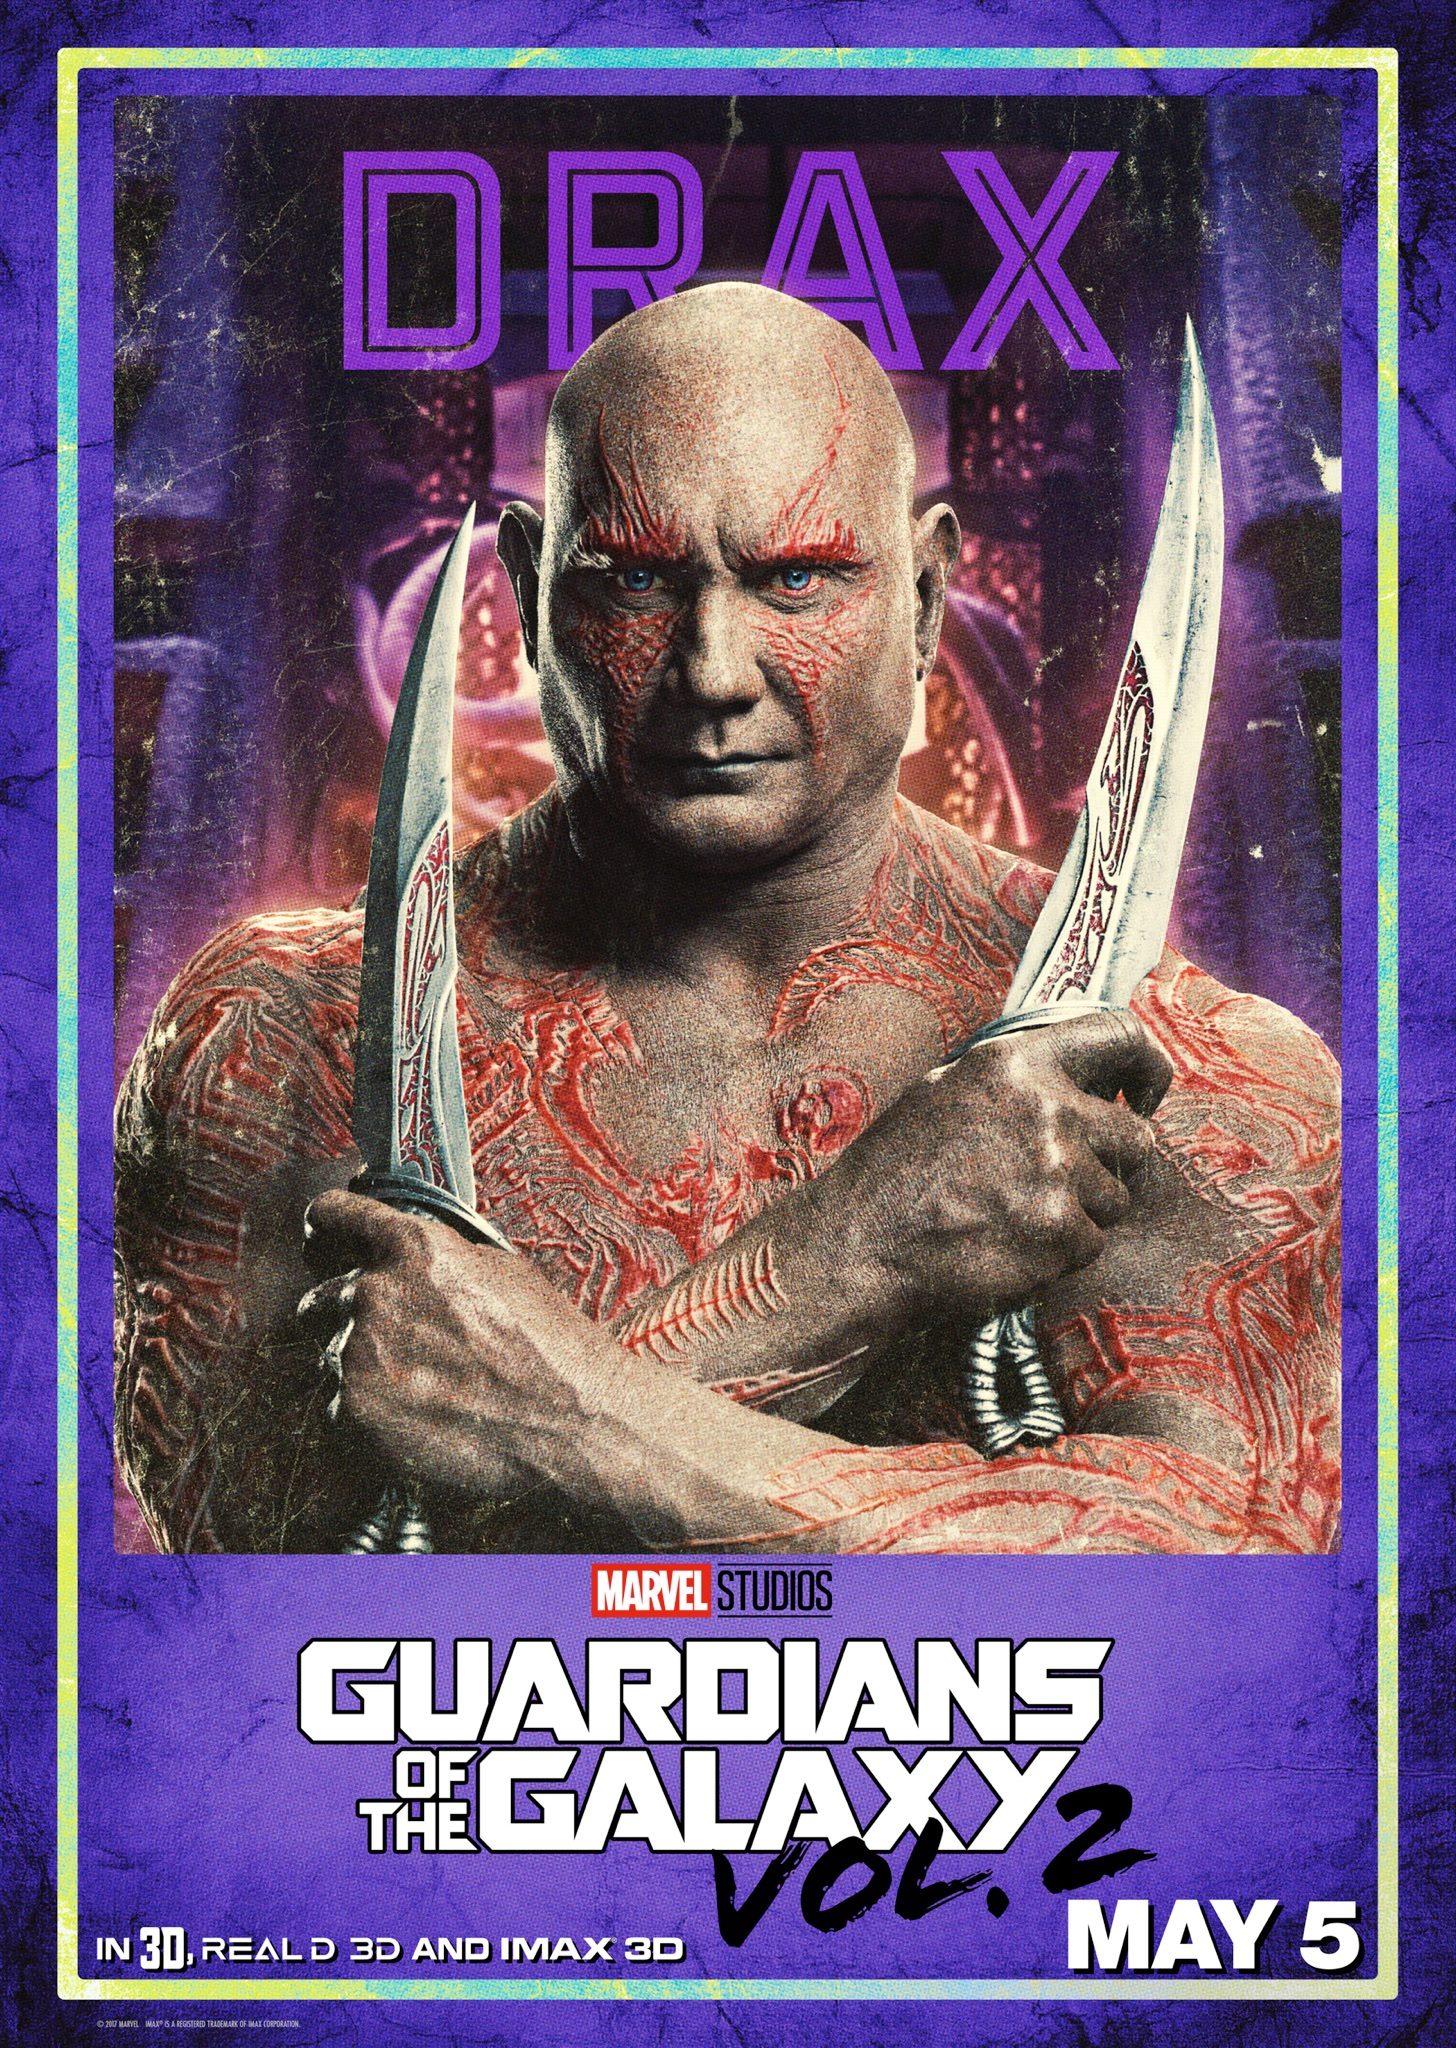 szmk_guardians_galaxy_galaxis_orzoi_karakter_plakat_5_1.jpg